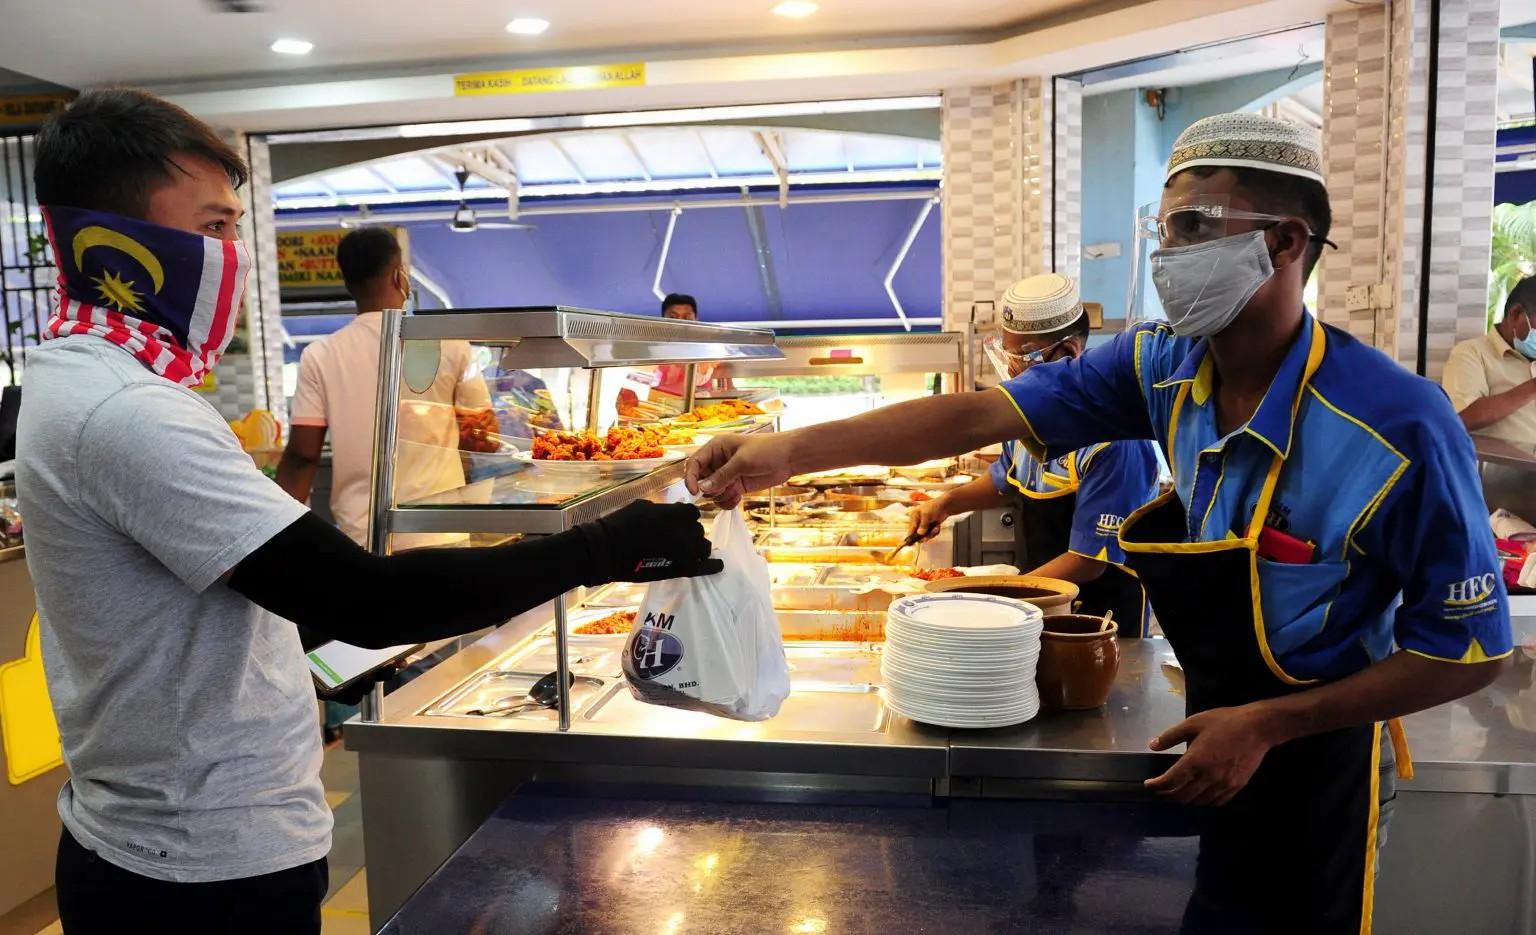 Premis Kedai Makan & Restoren Dibenarkan Beroperasi Sehingga 10 Malam